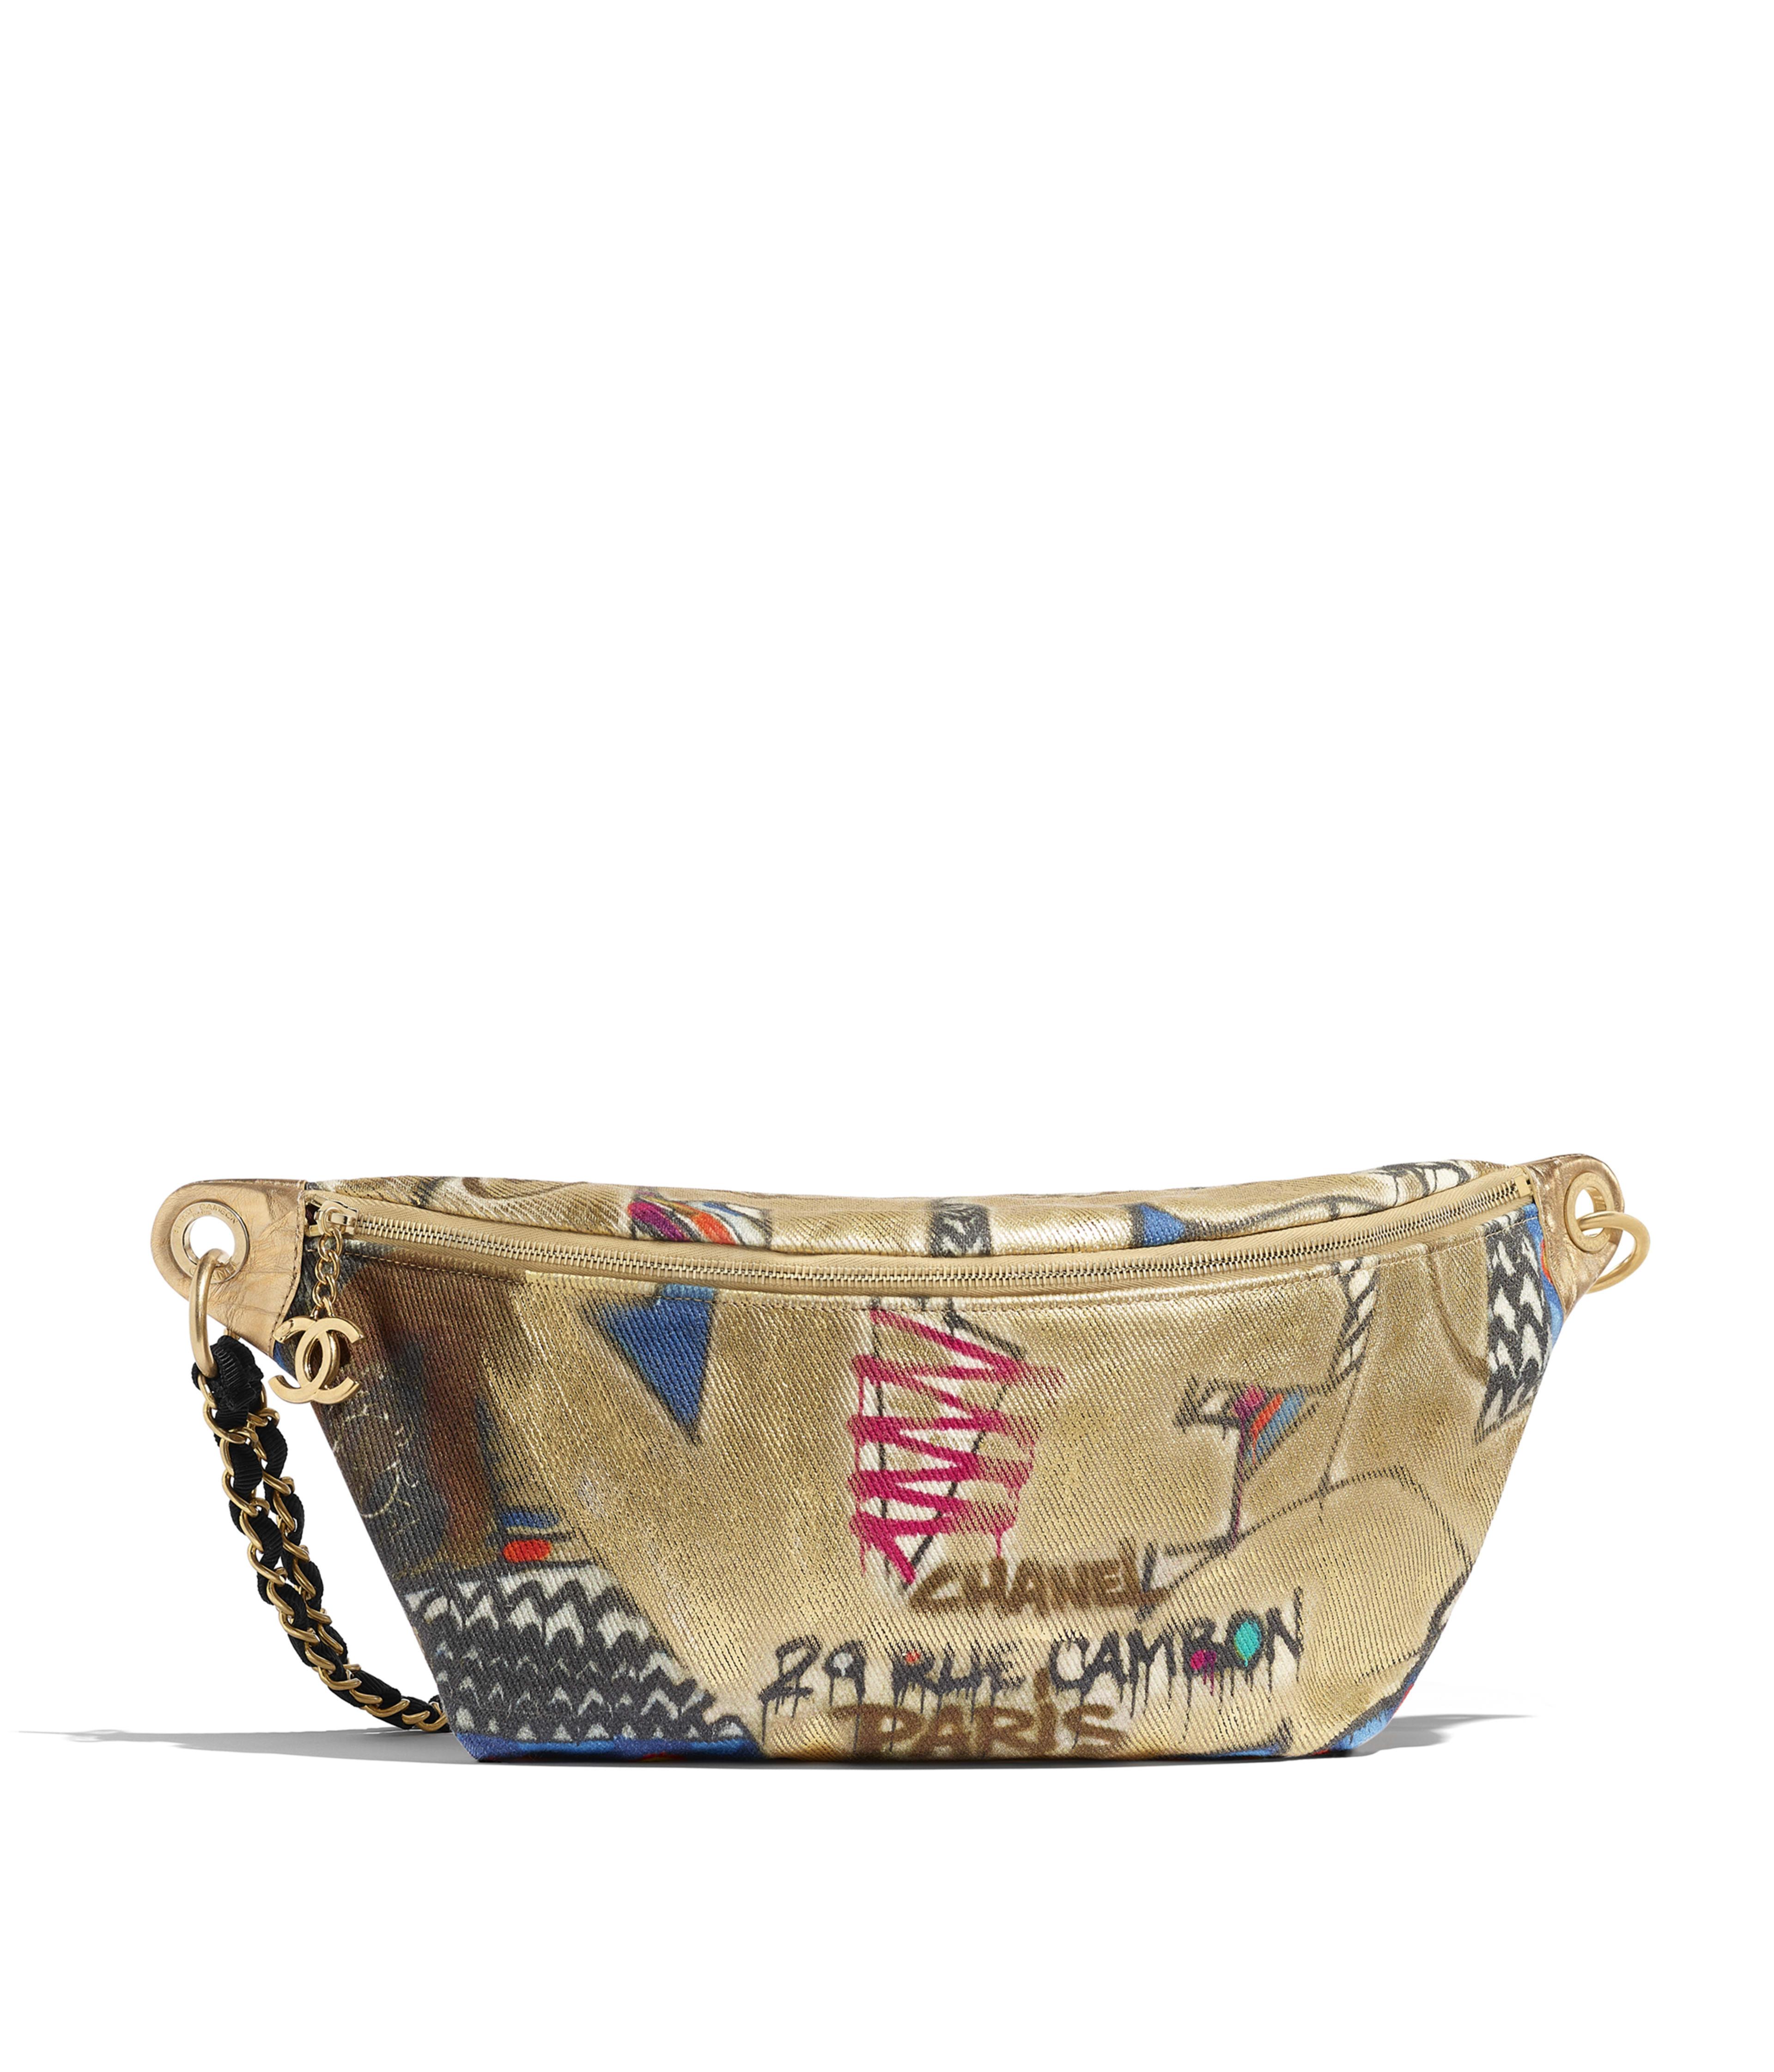 ad39e6e91e7 Waist Bag Calfskin, Cotton & Gold-Tone Metal, Multicolor Ref.  AS0868B0090099999